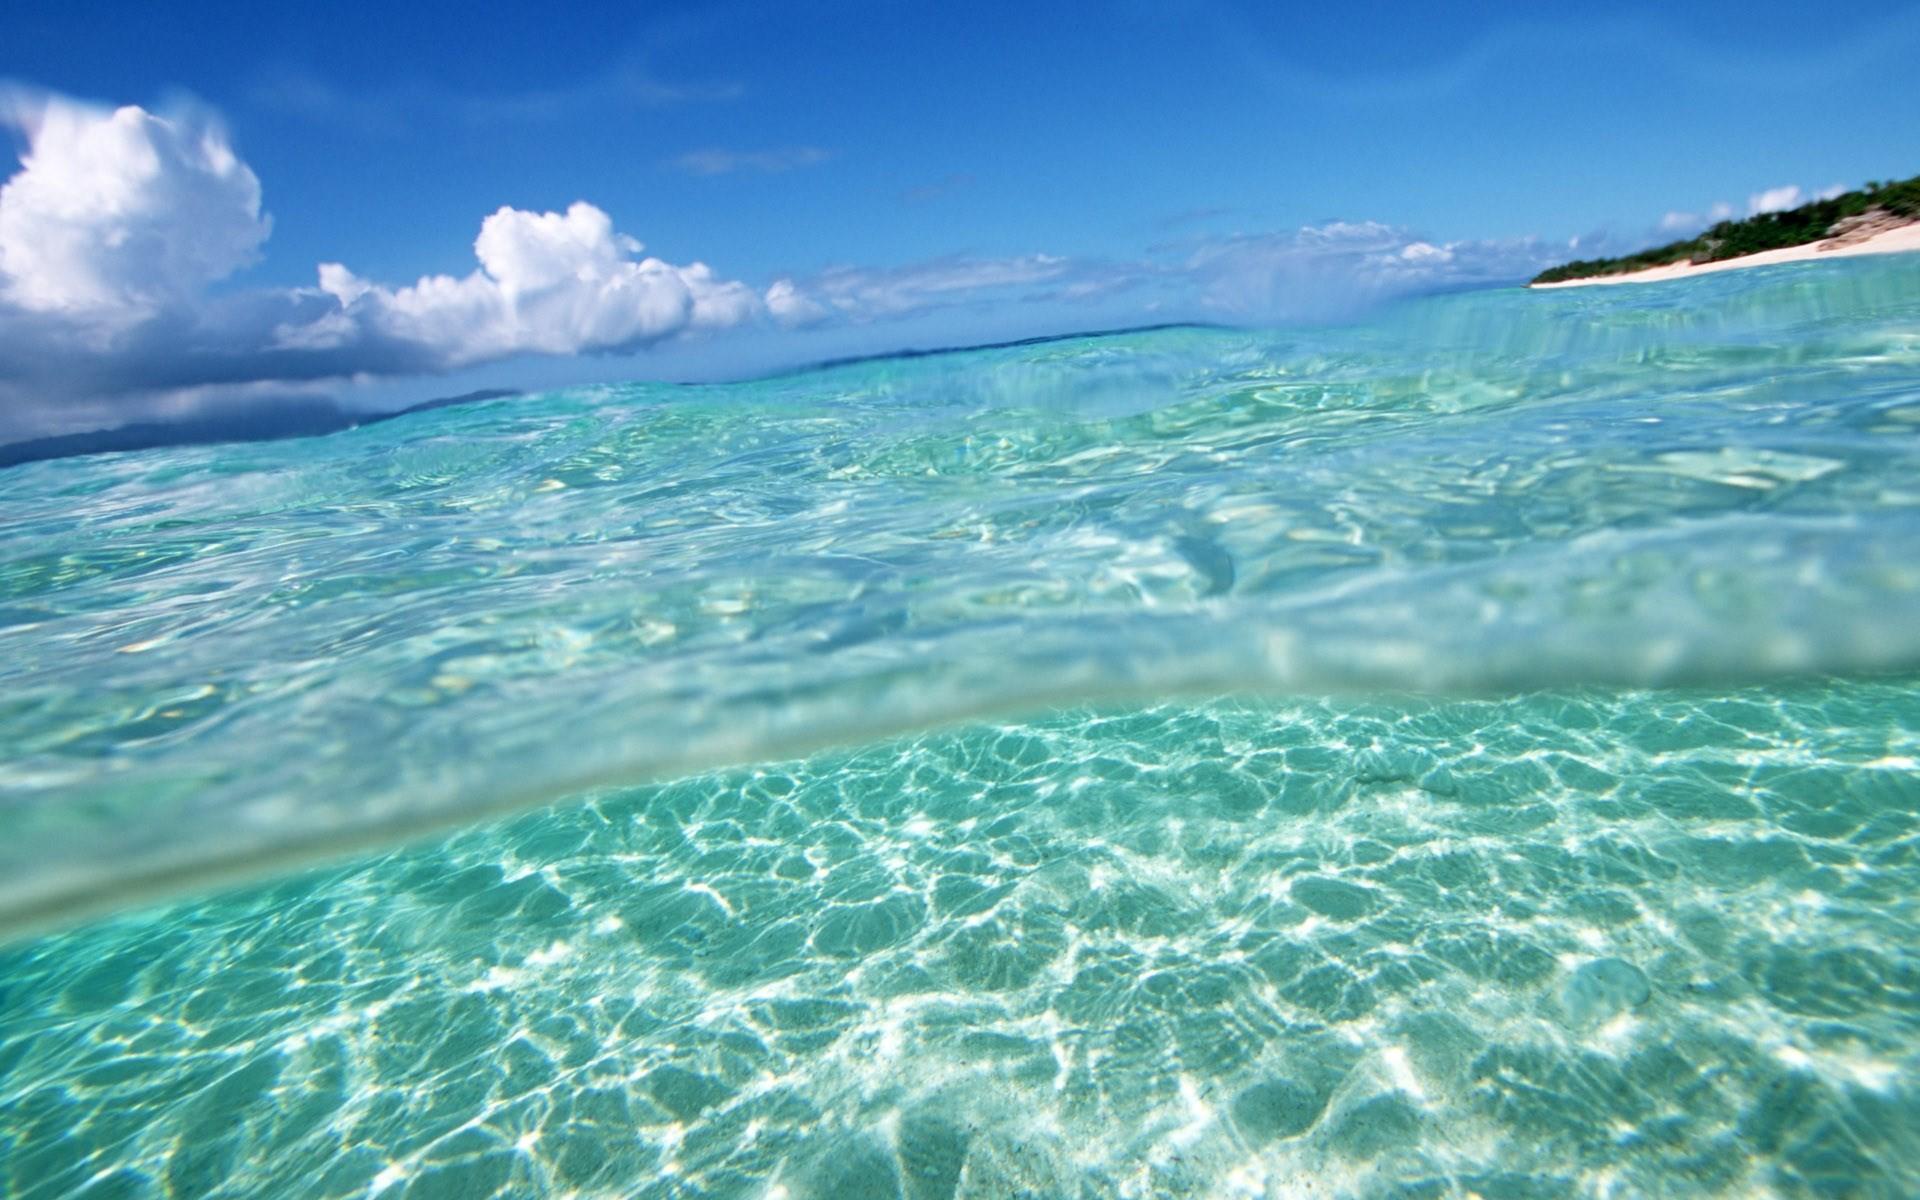 ocean desktop background  70  images